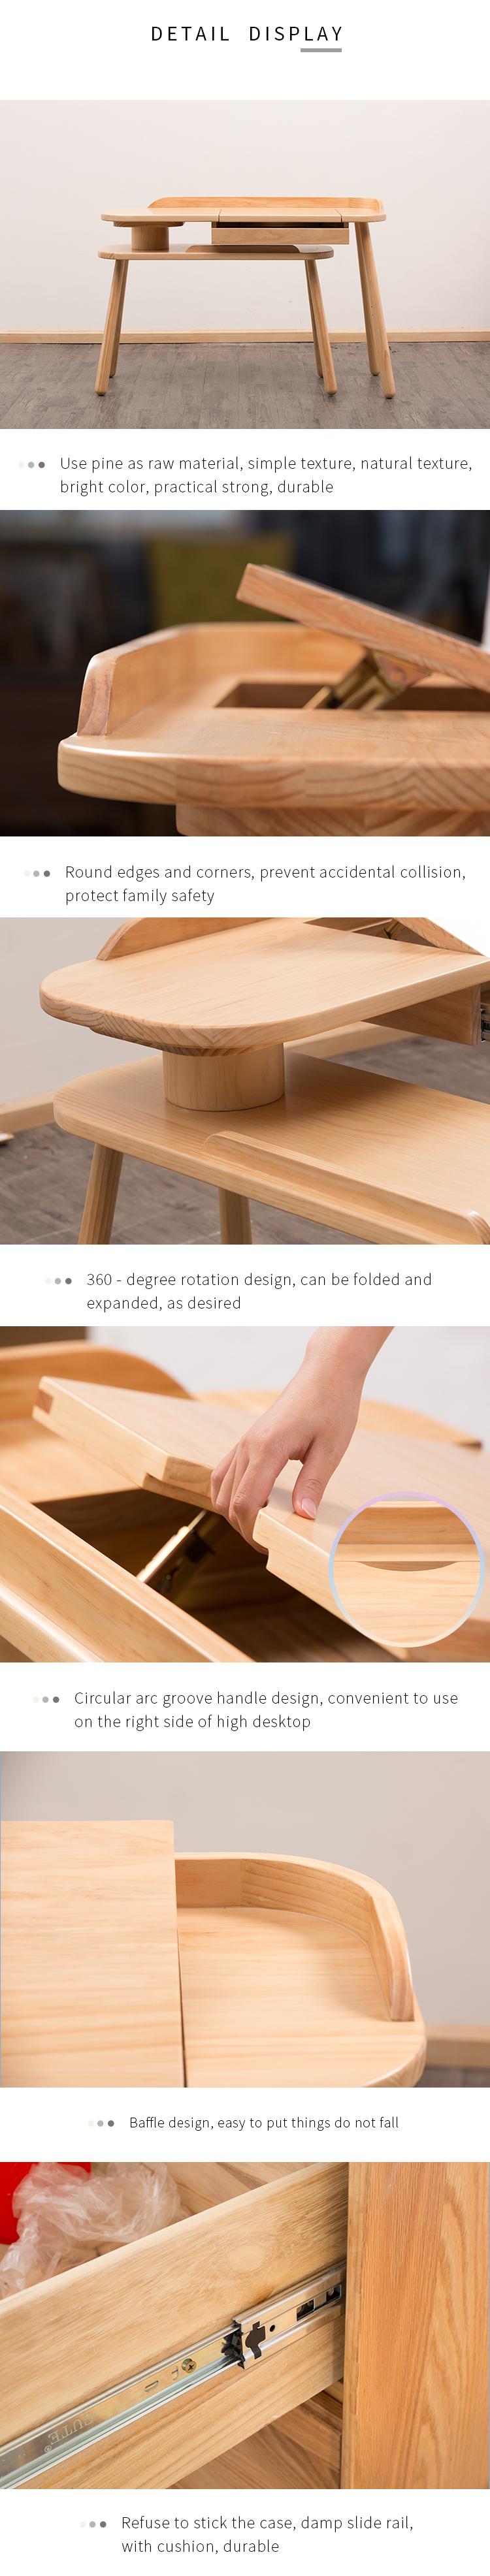 product-BoomDear Wood-img-6